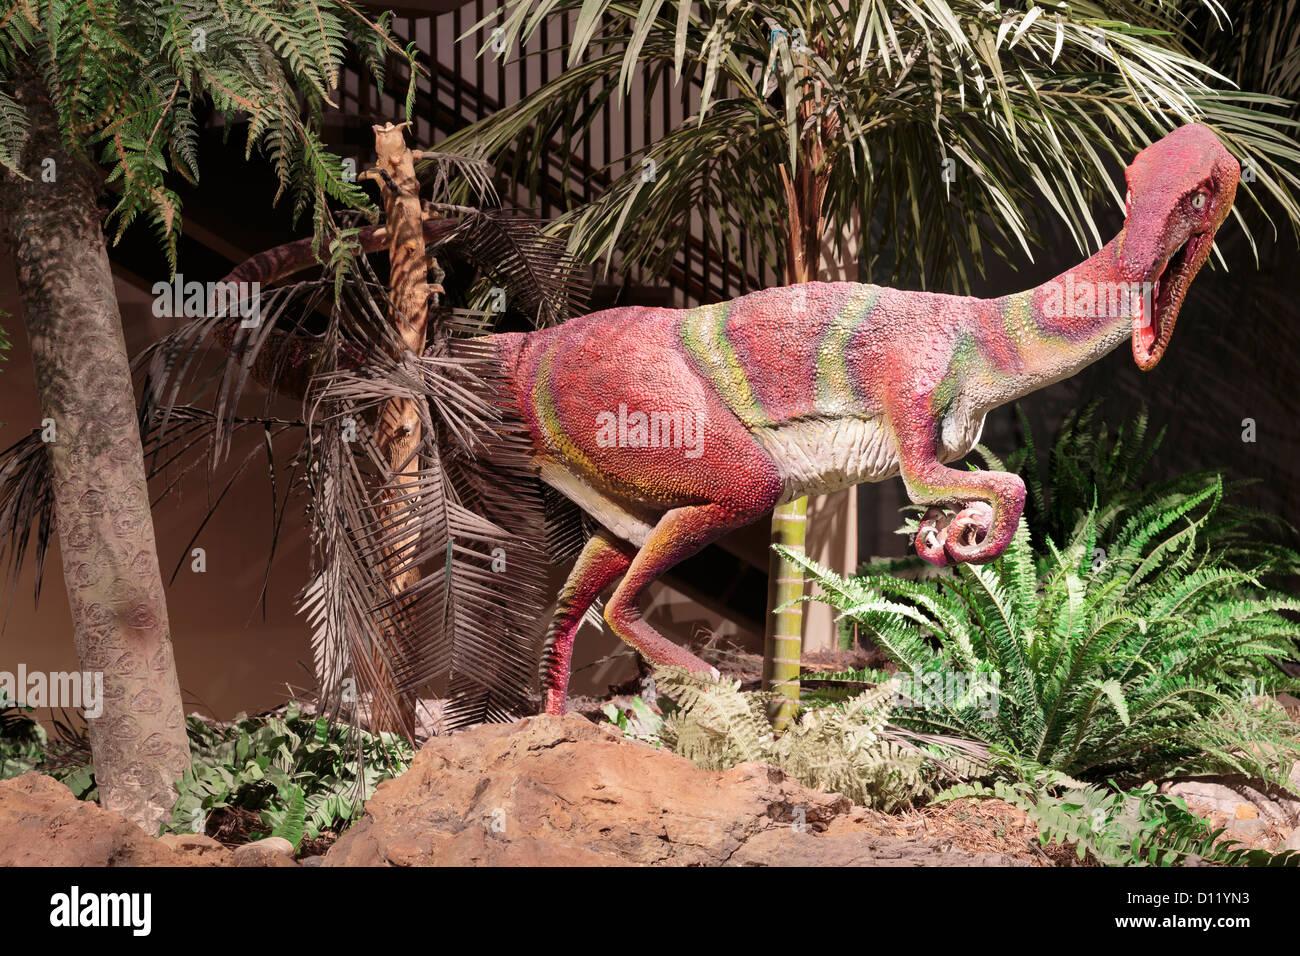 Coelophysis nel Museo di Scienze Naturali,Herman Park,Houston, Texas, Stati Uniti d'America Immagini Stock